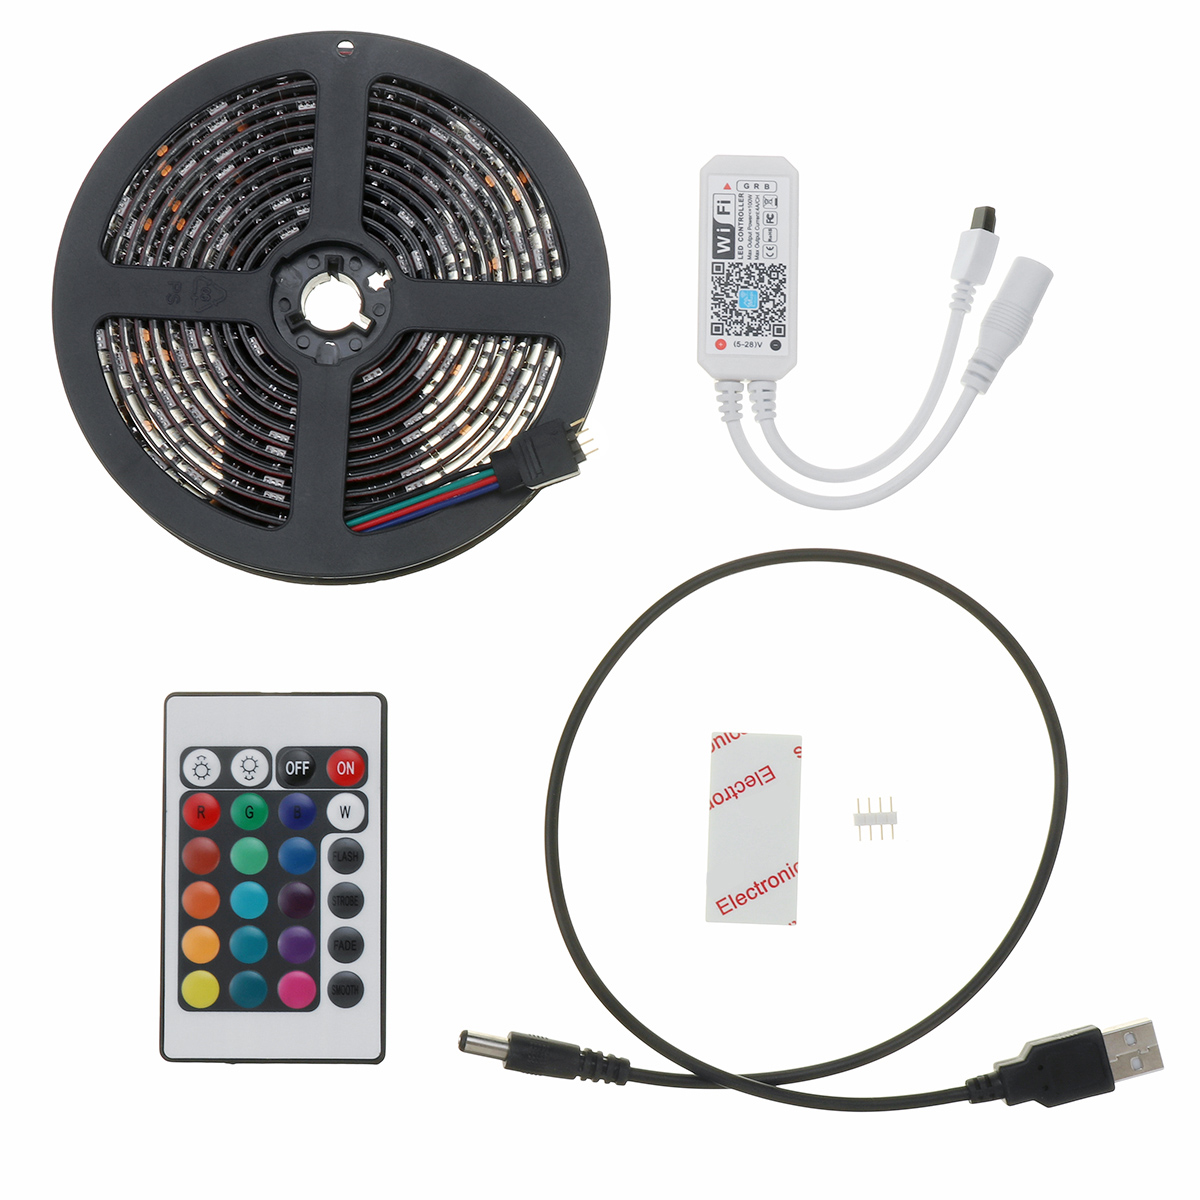 1M 2M 3M USB Waterproof IP65 RGB 5050 WIFI LED Strip Light Kit With 24 Key Remote Control DC5V